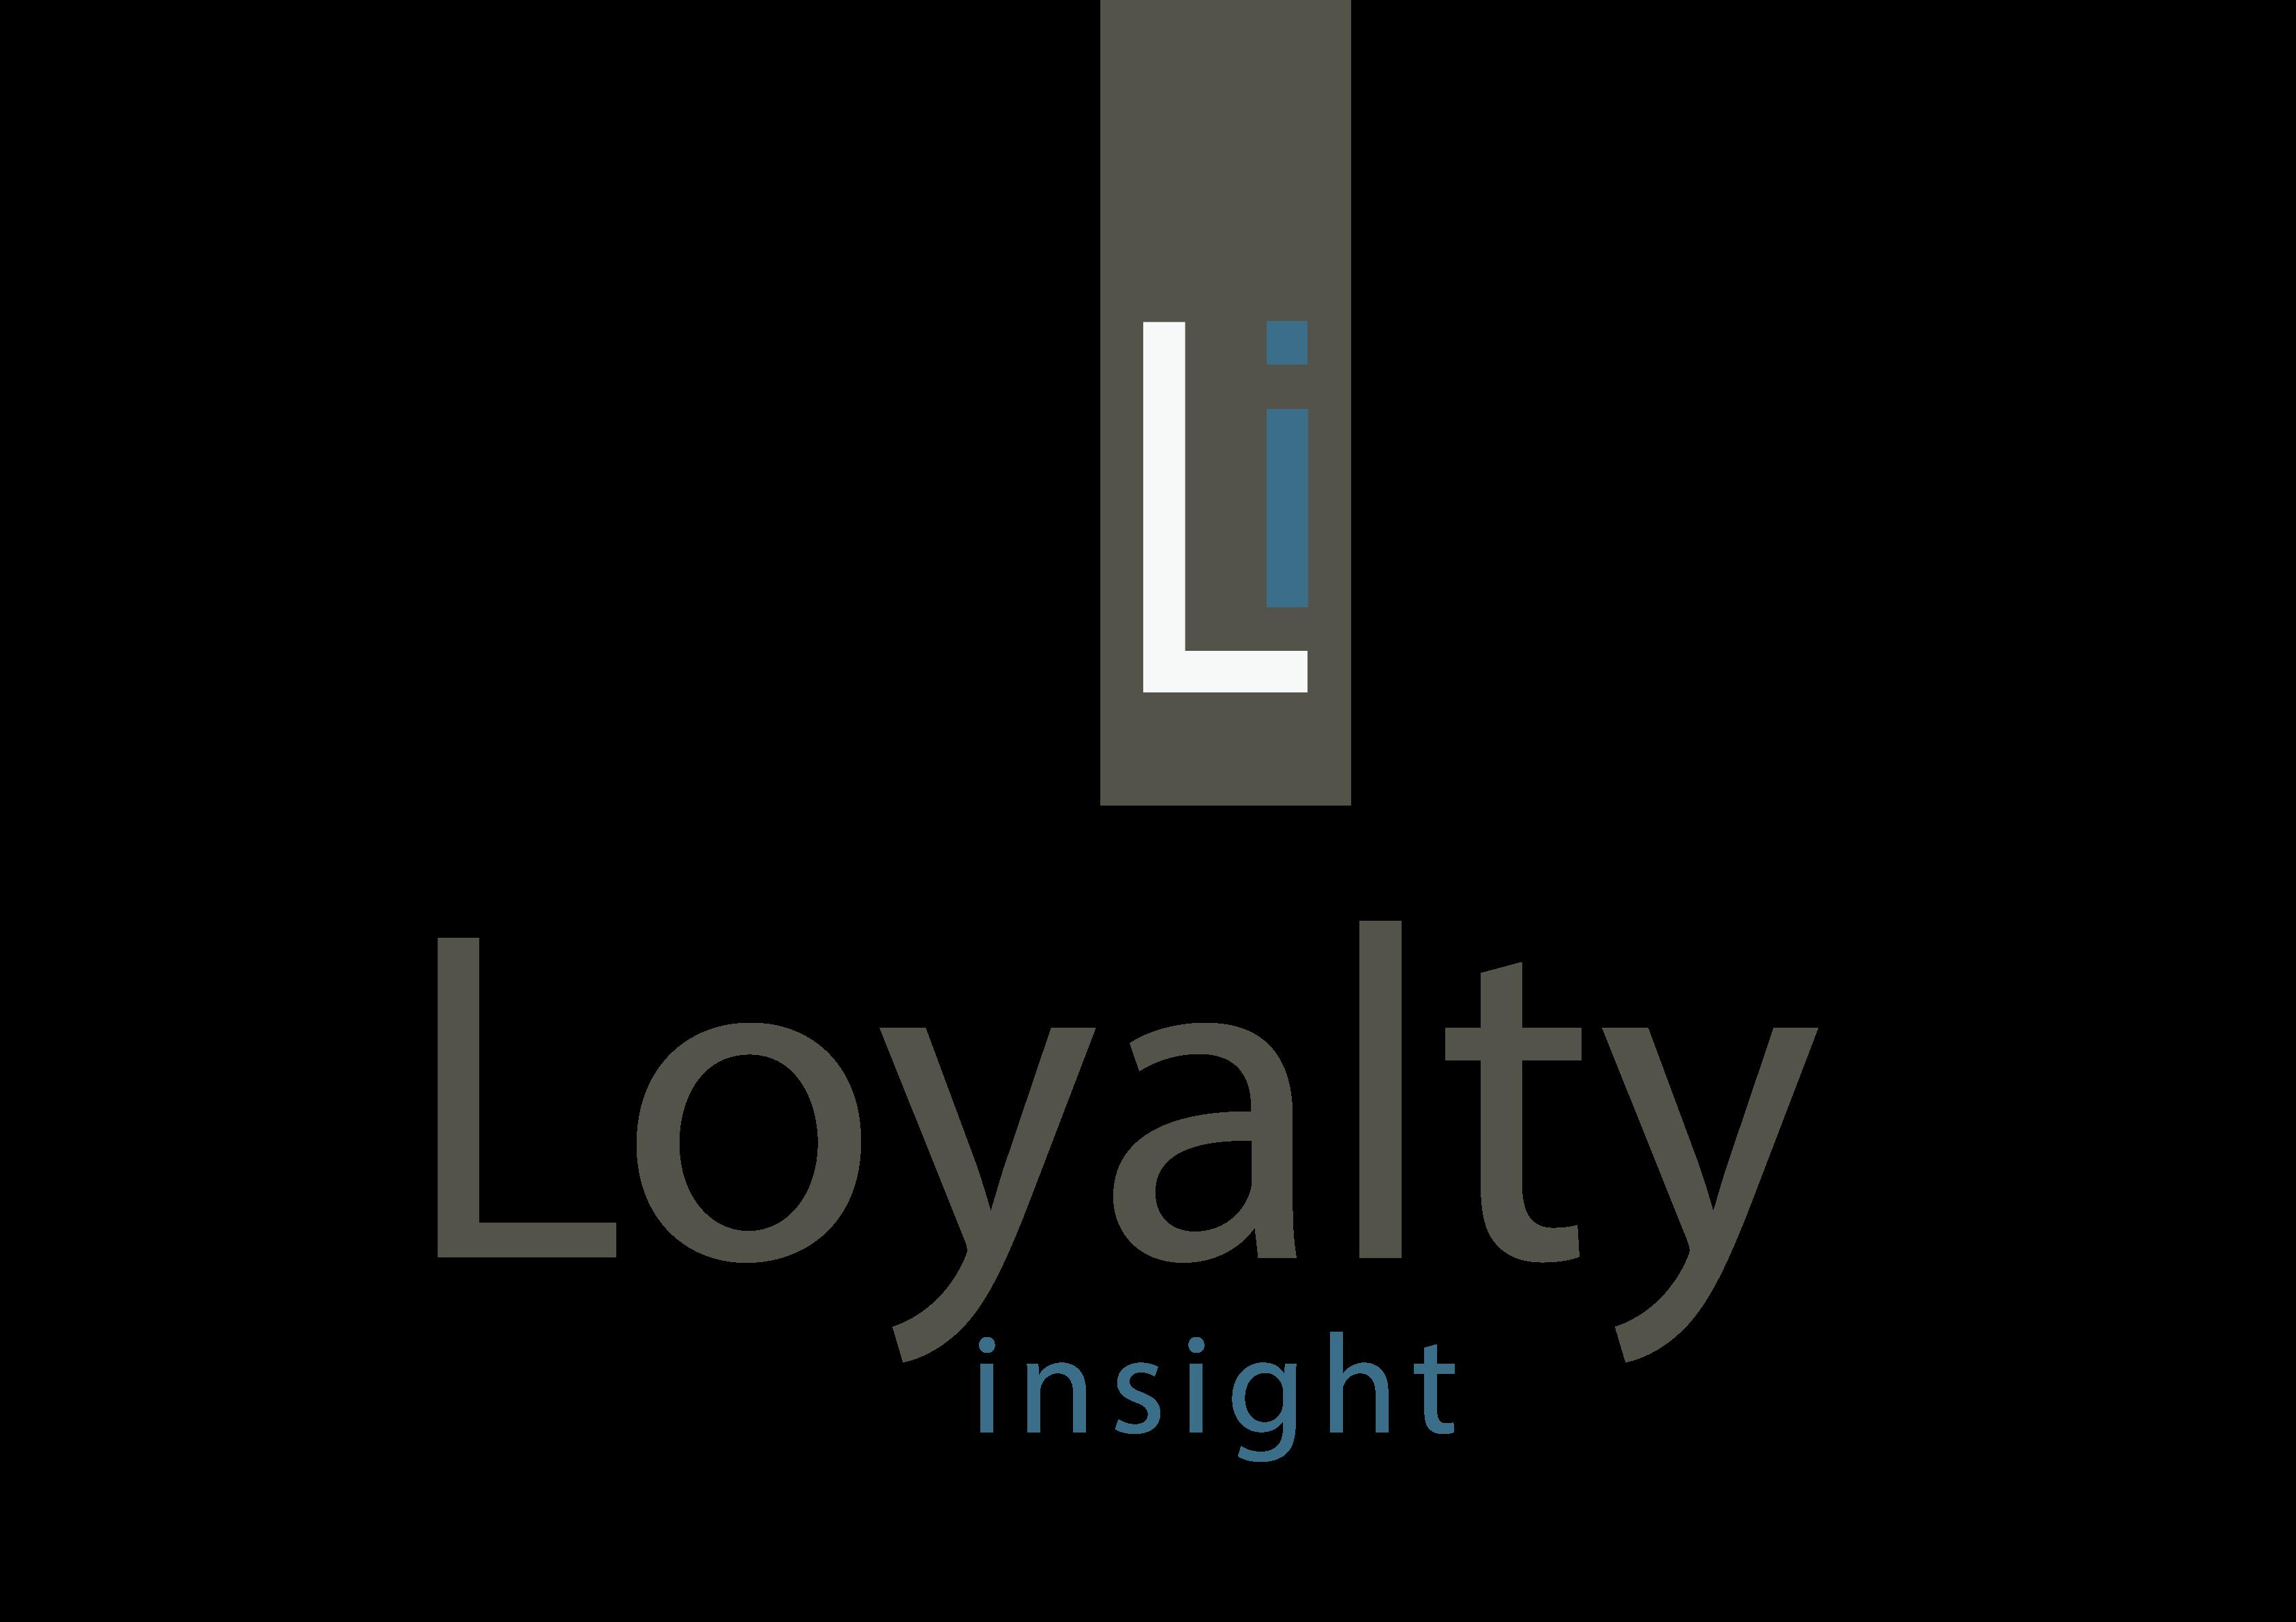 Loyalty Insights